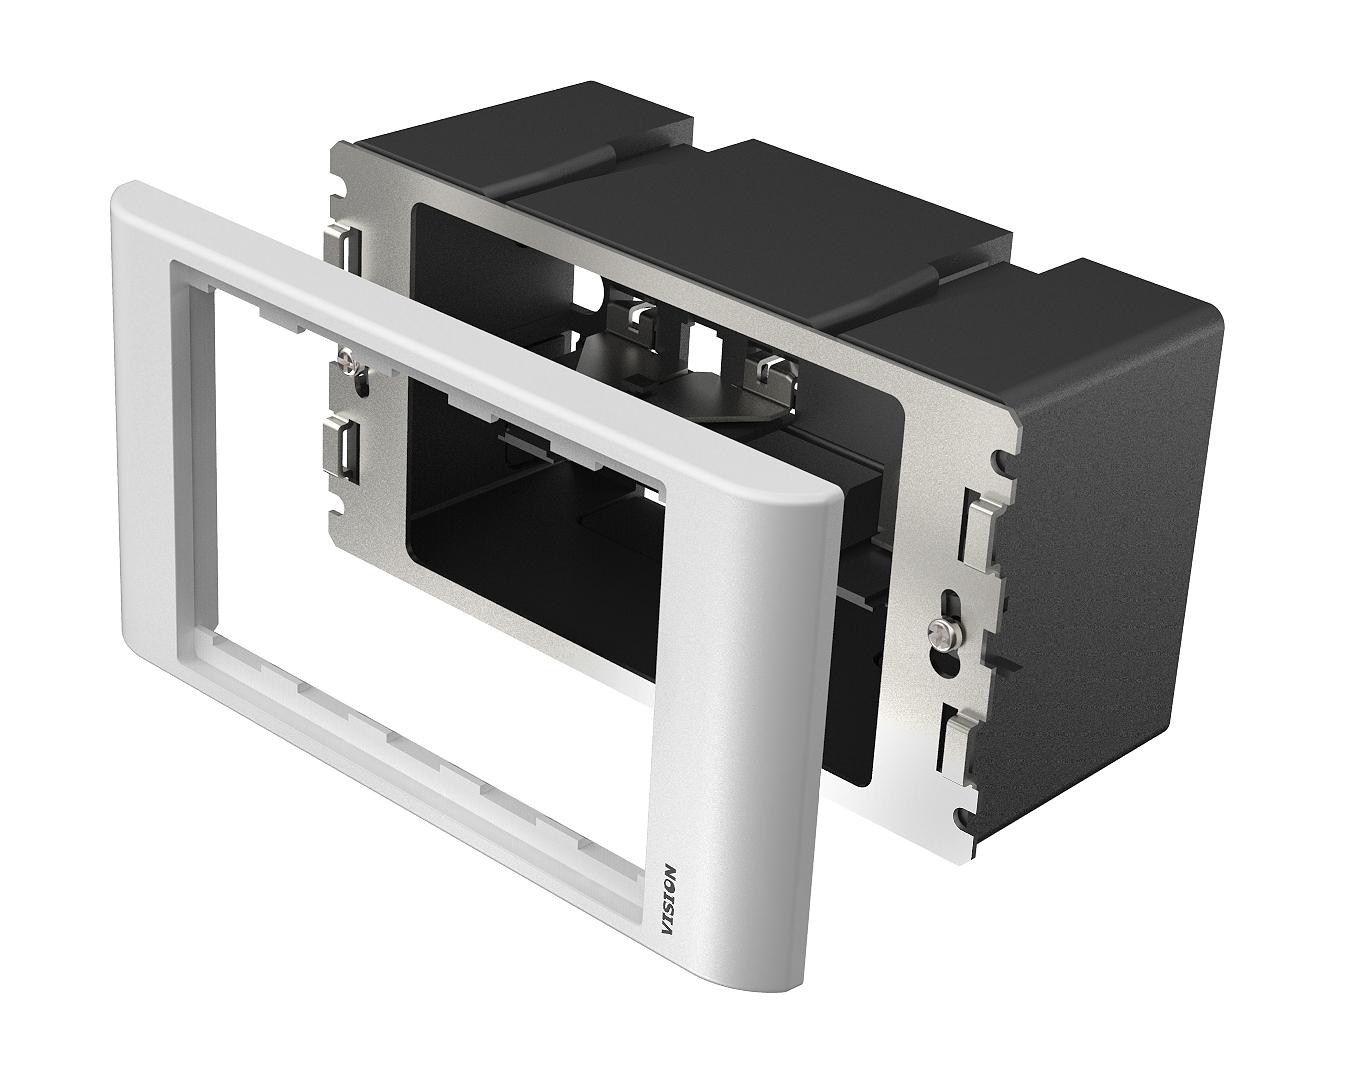 Vision TCDE SURR2G outlet box